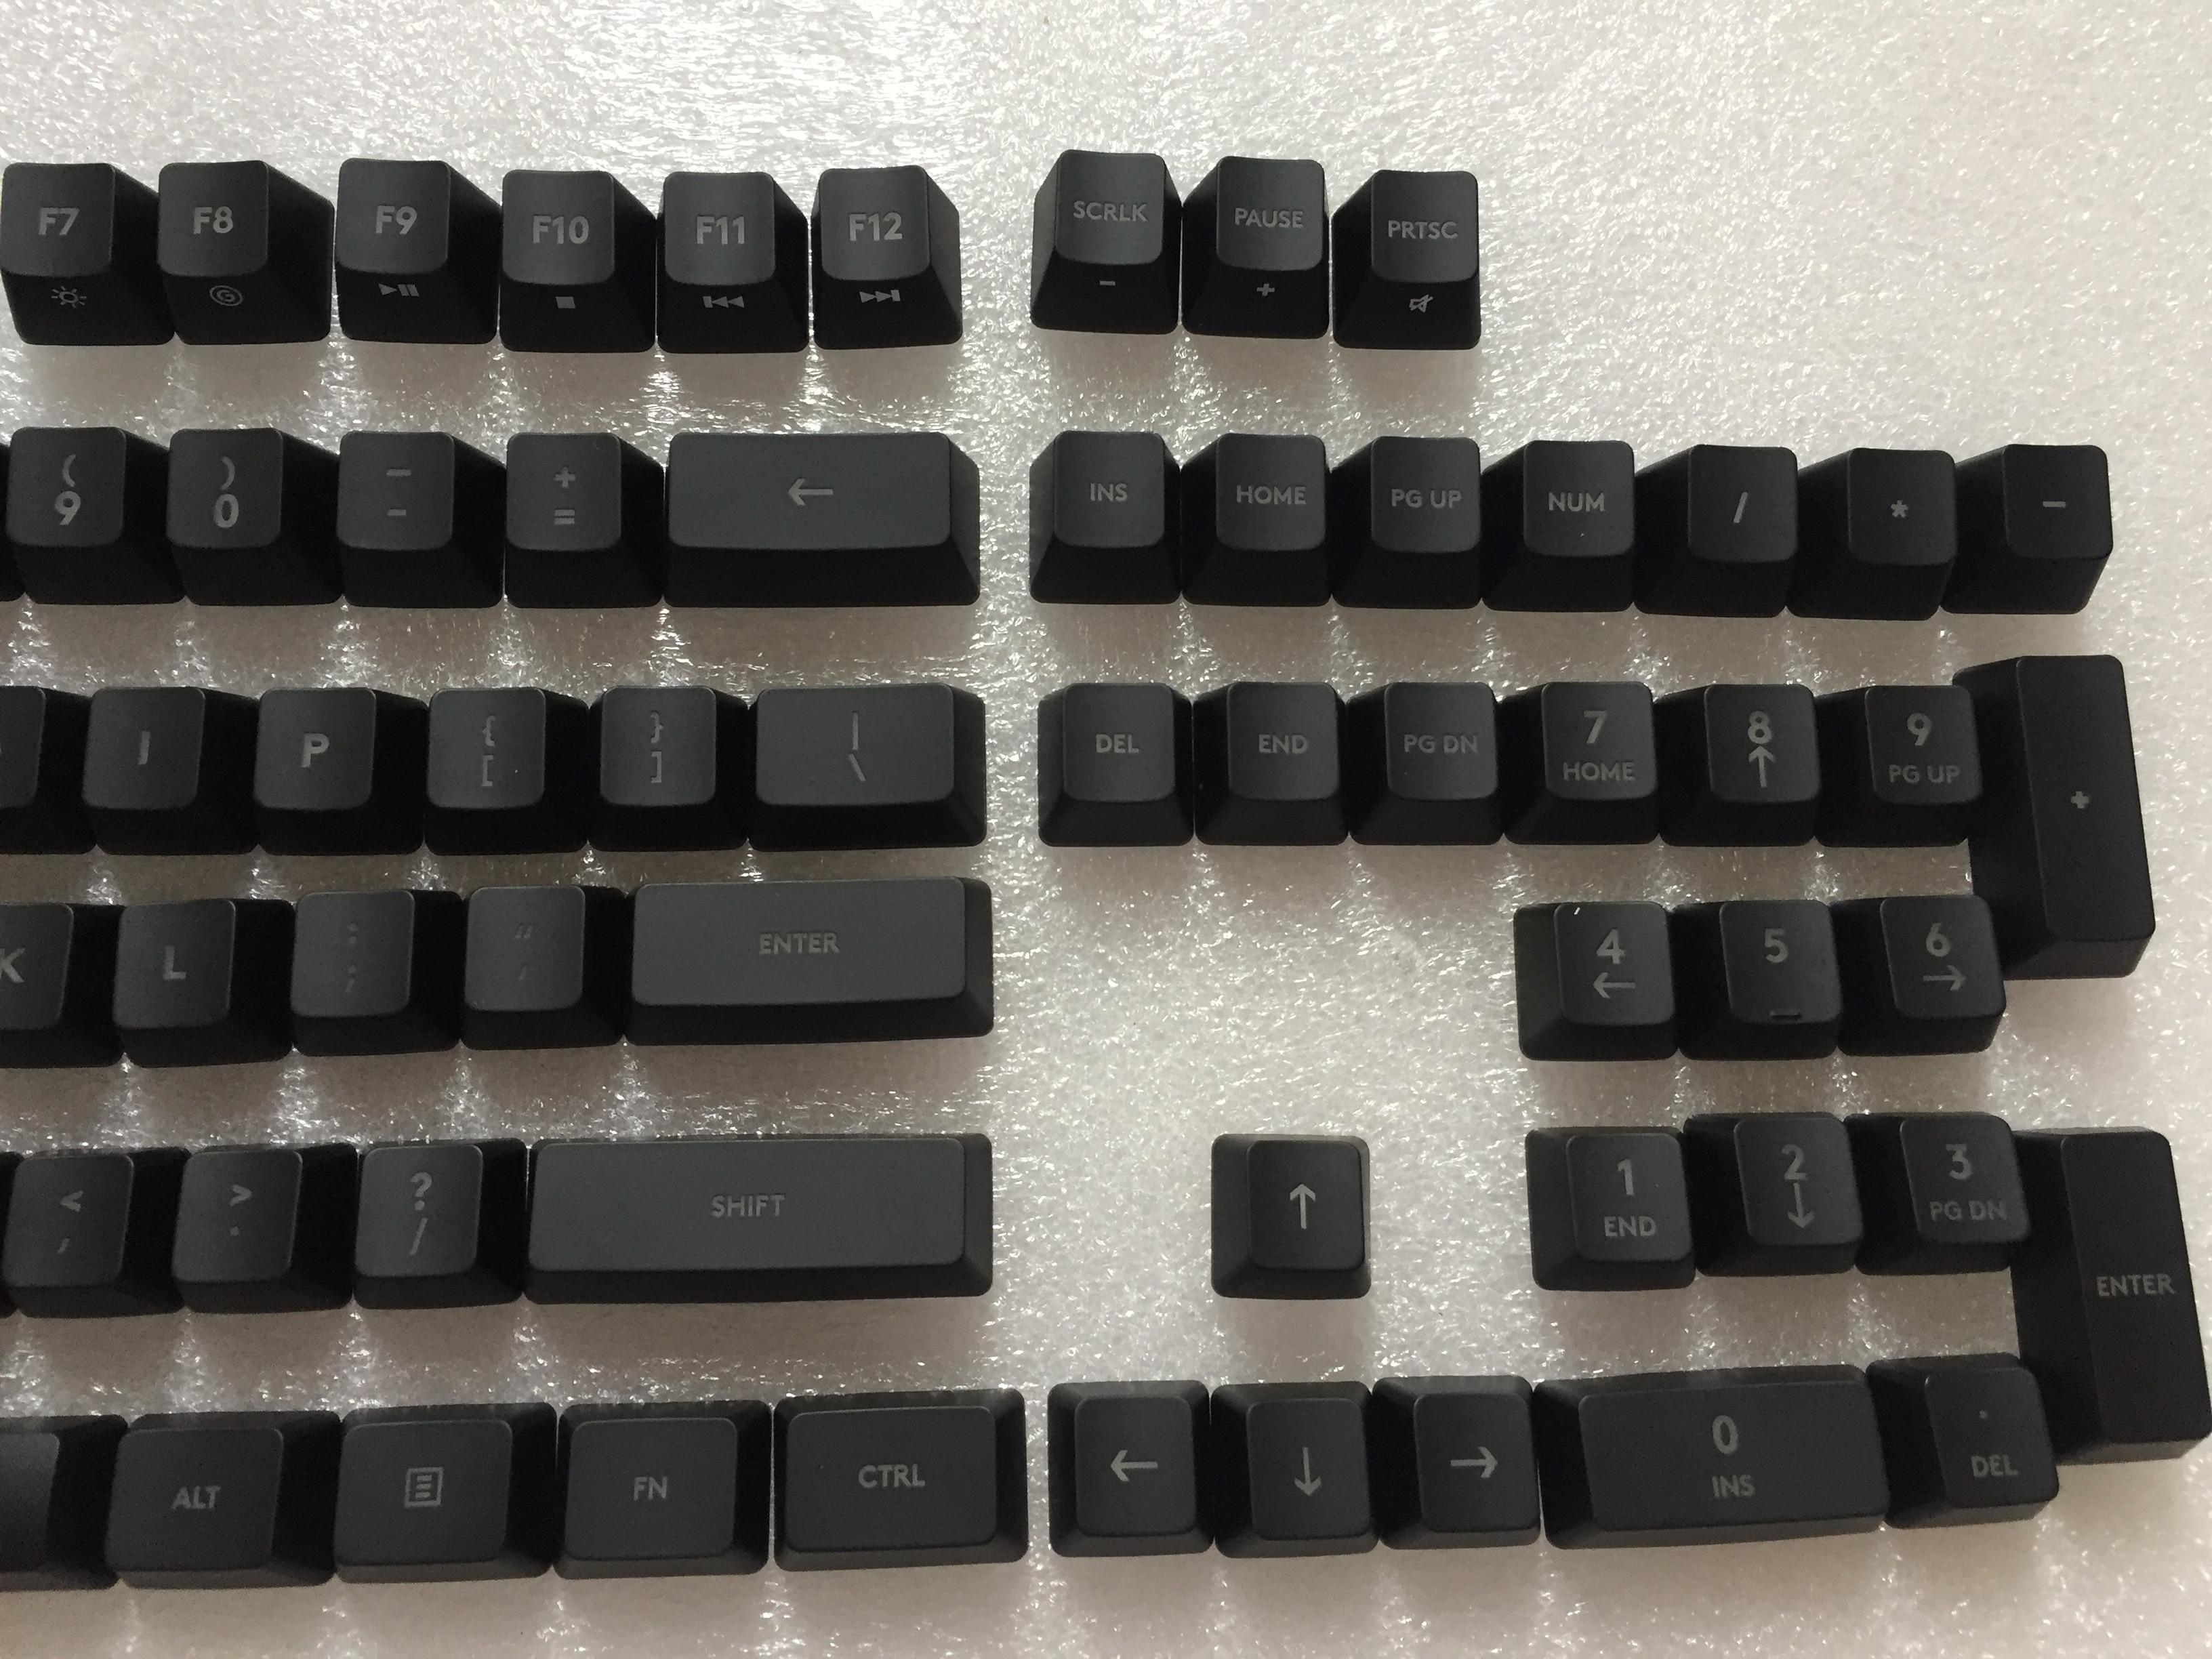 1 Piece Original ESC Ctrl Alt Space Key Cap For Logitech G512 Keyboard With Romer-g Switch Bracket Also In Stock